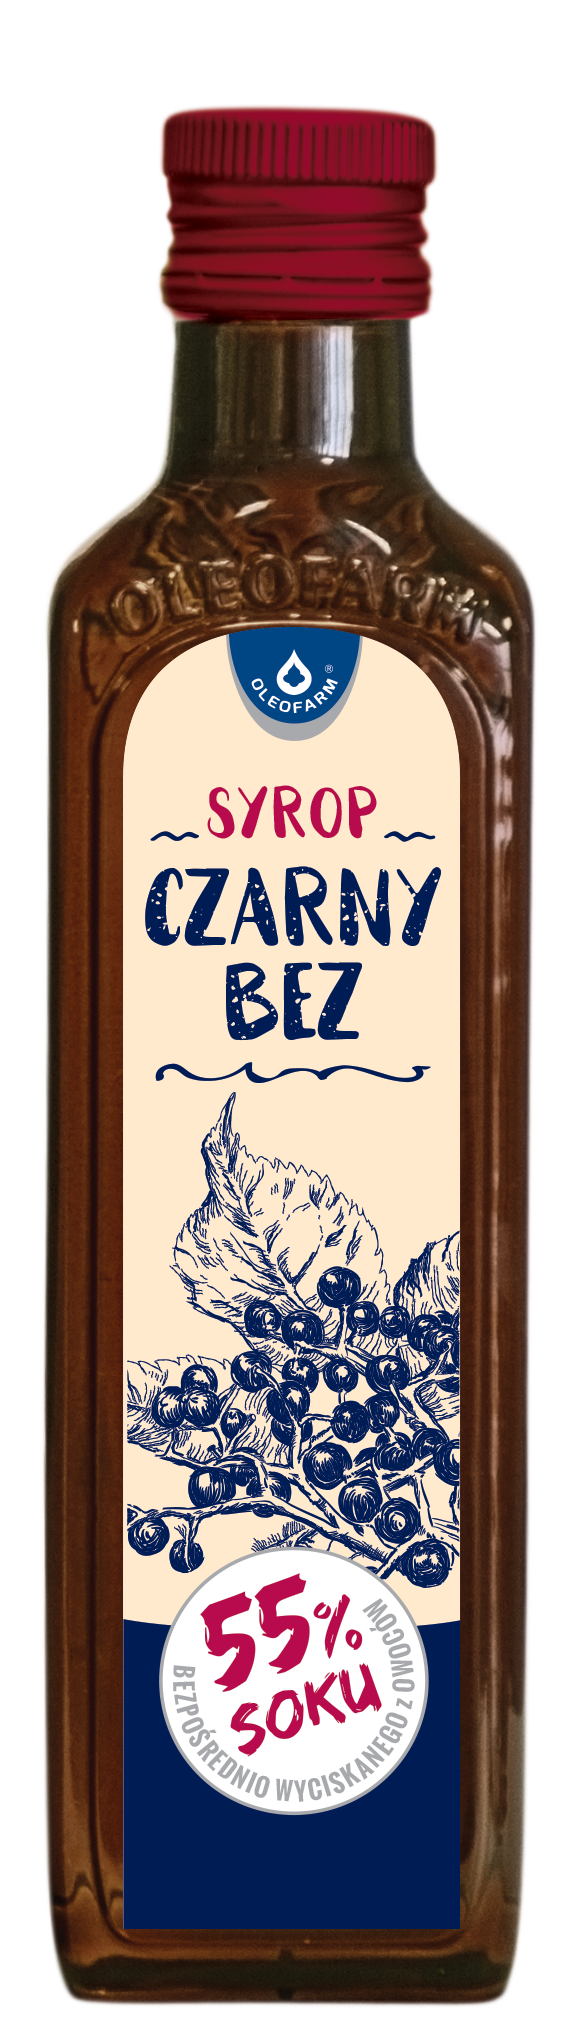 OLEOFARM, Syrop Czarny Bez (55%soku) 250ml.